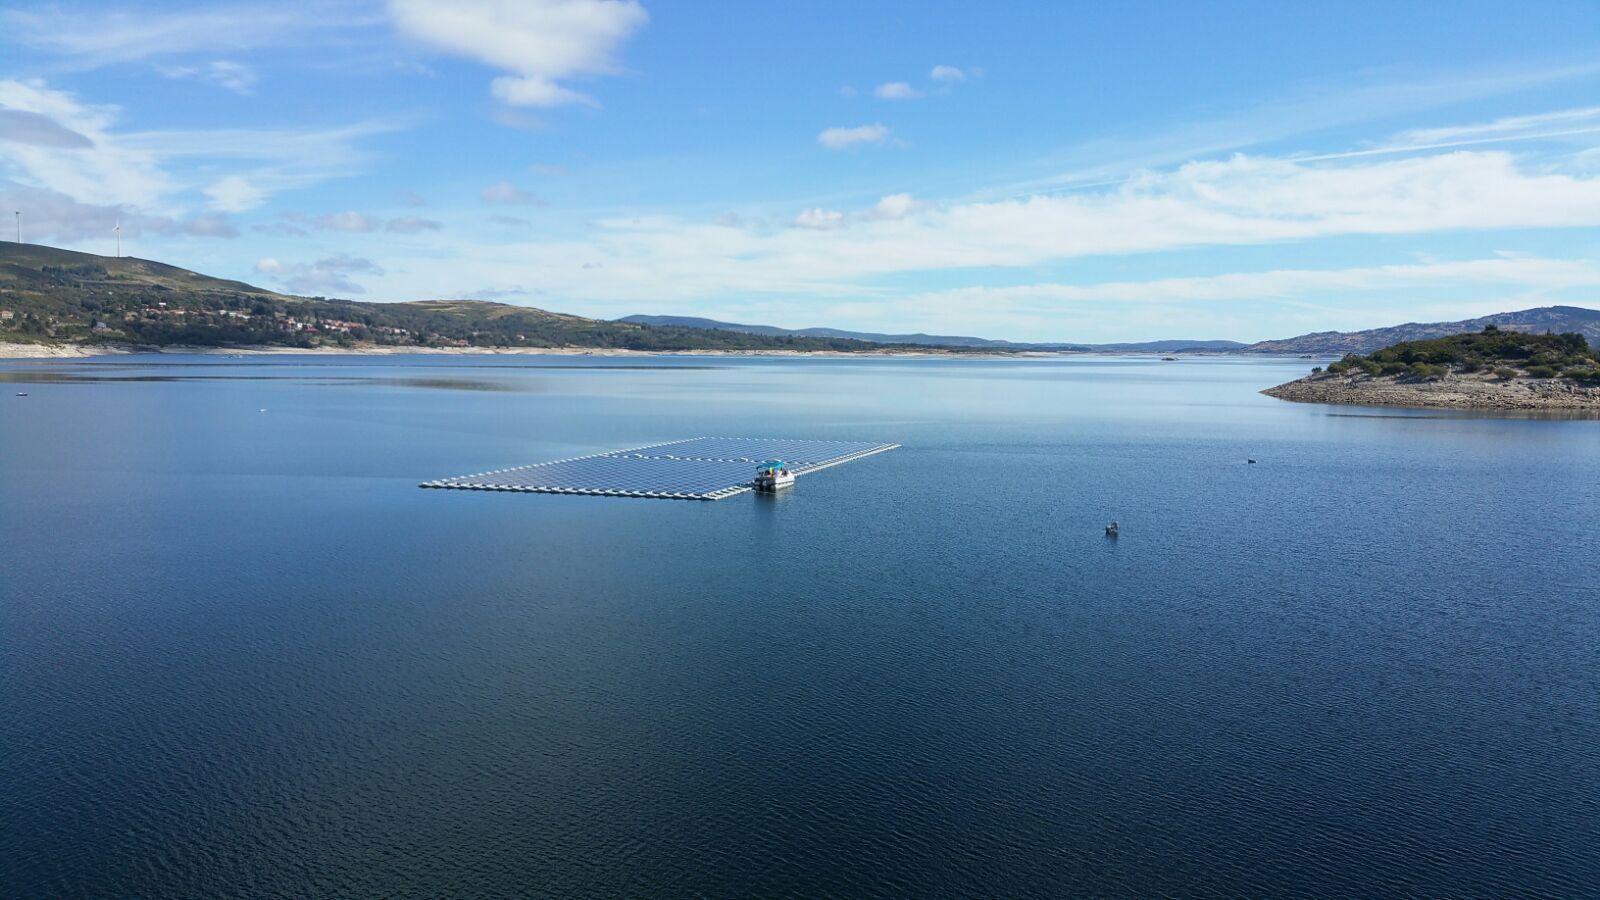 hidro güneş santrali